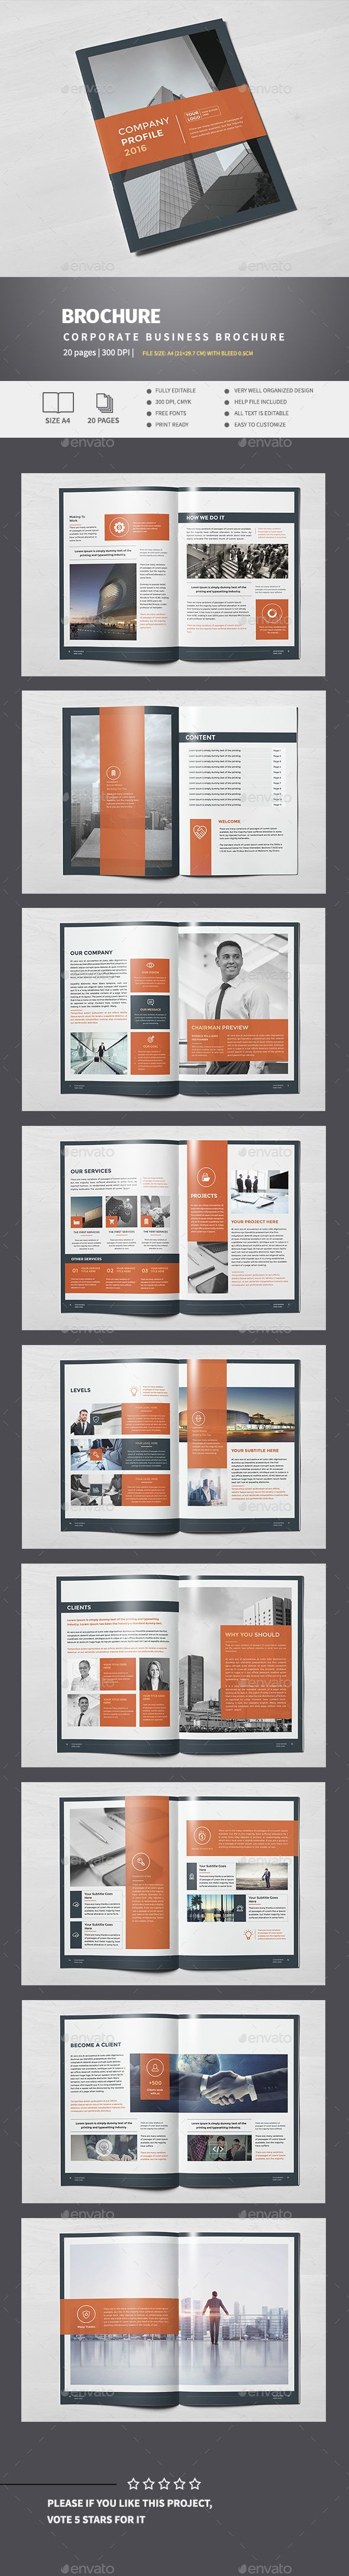 852 best Books Layout Catalog images on Pinterest